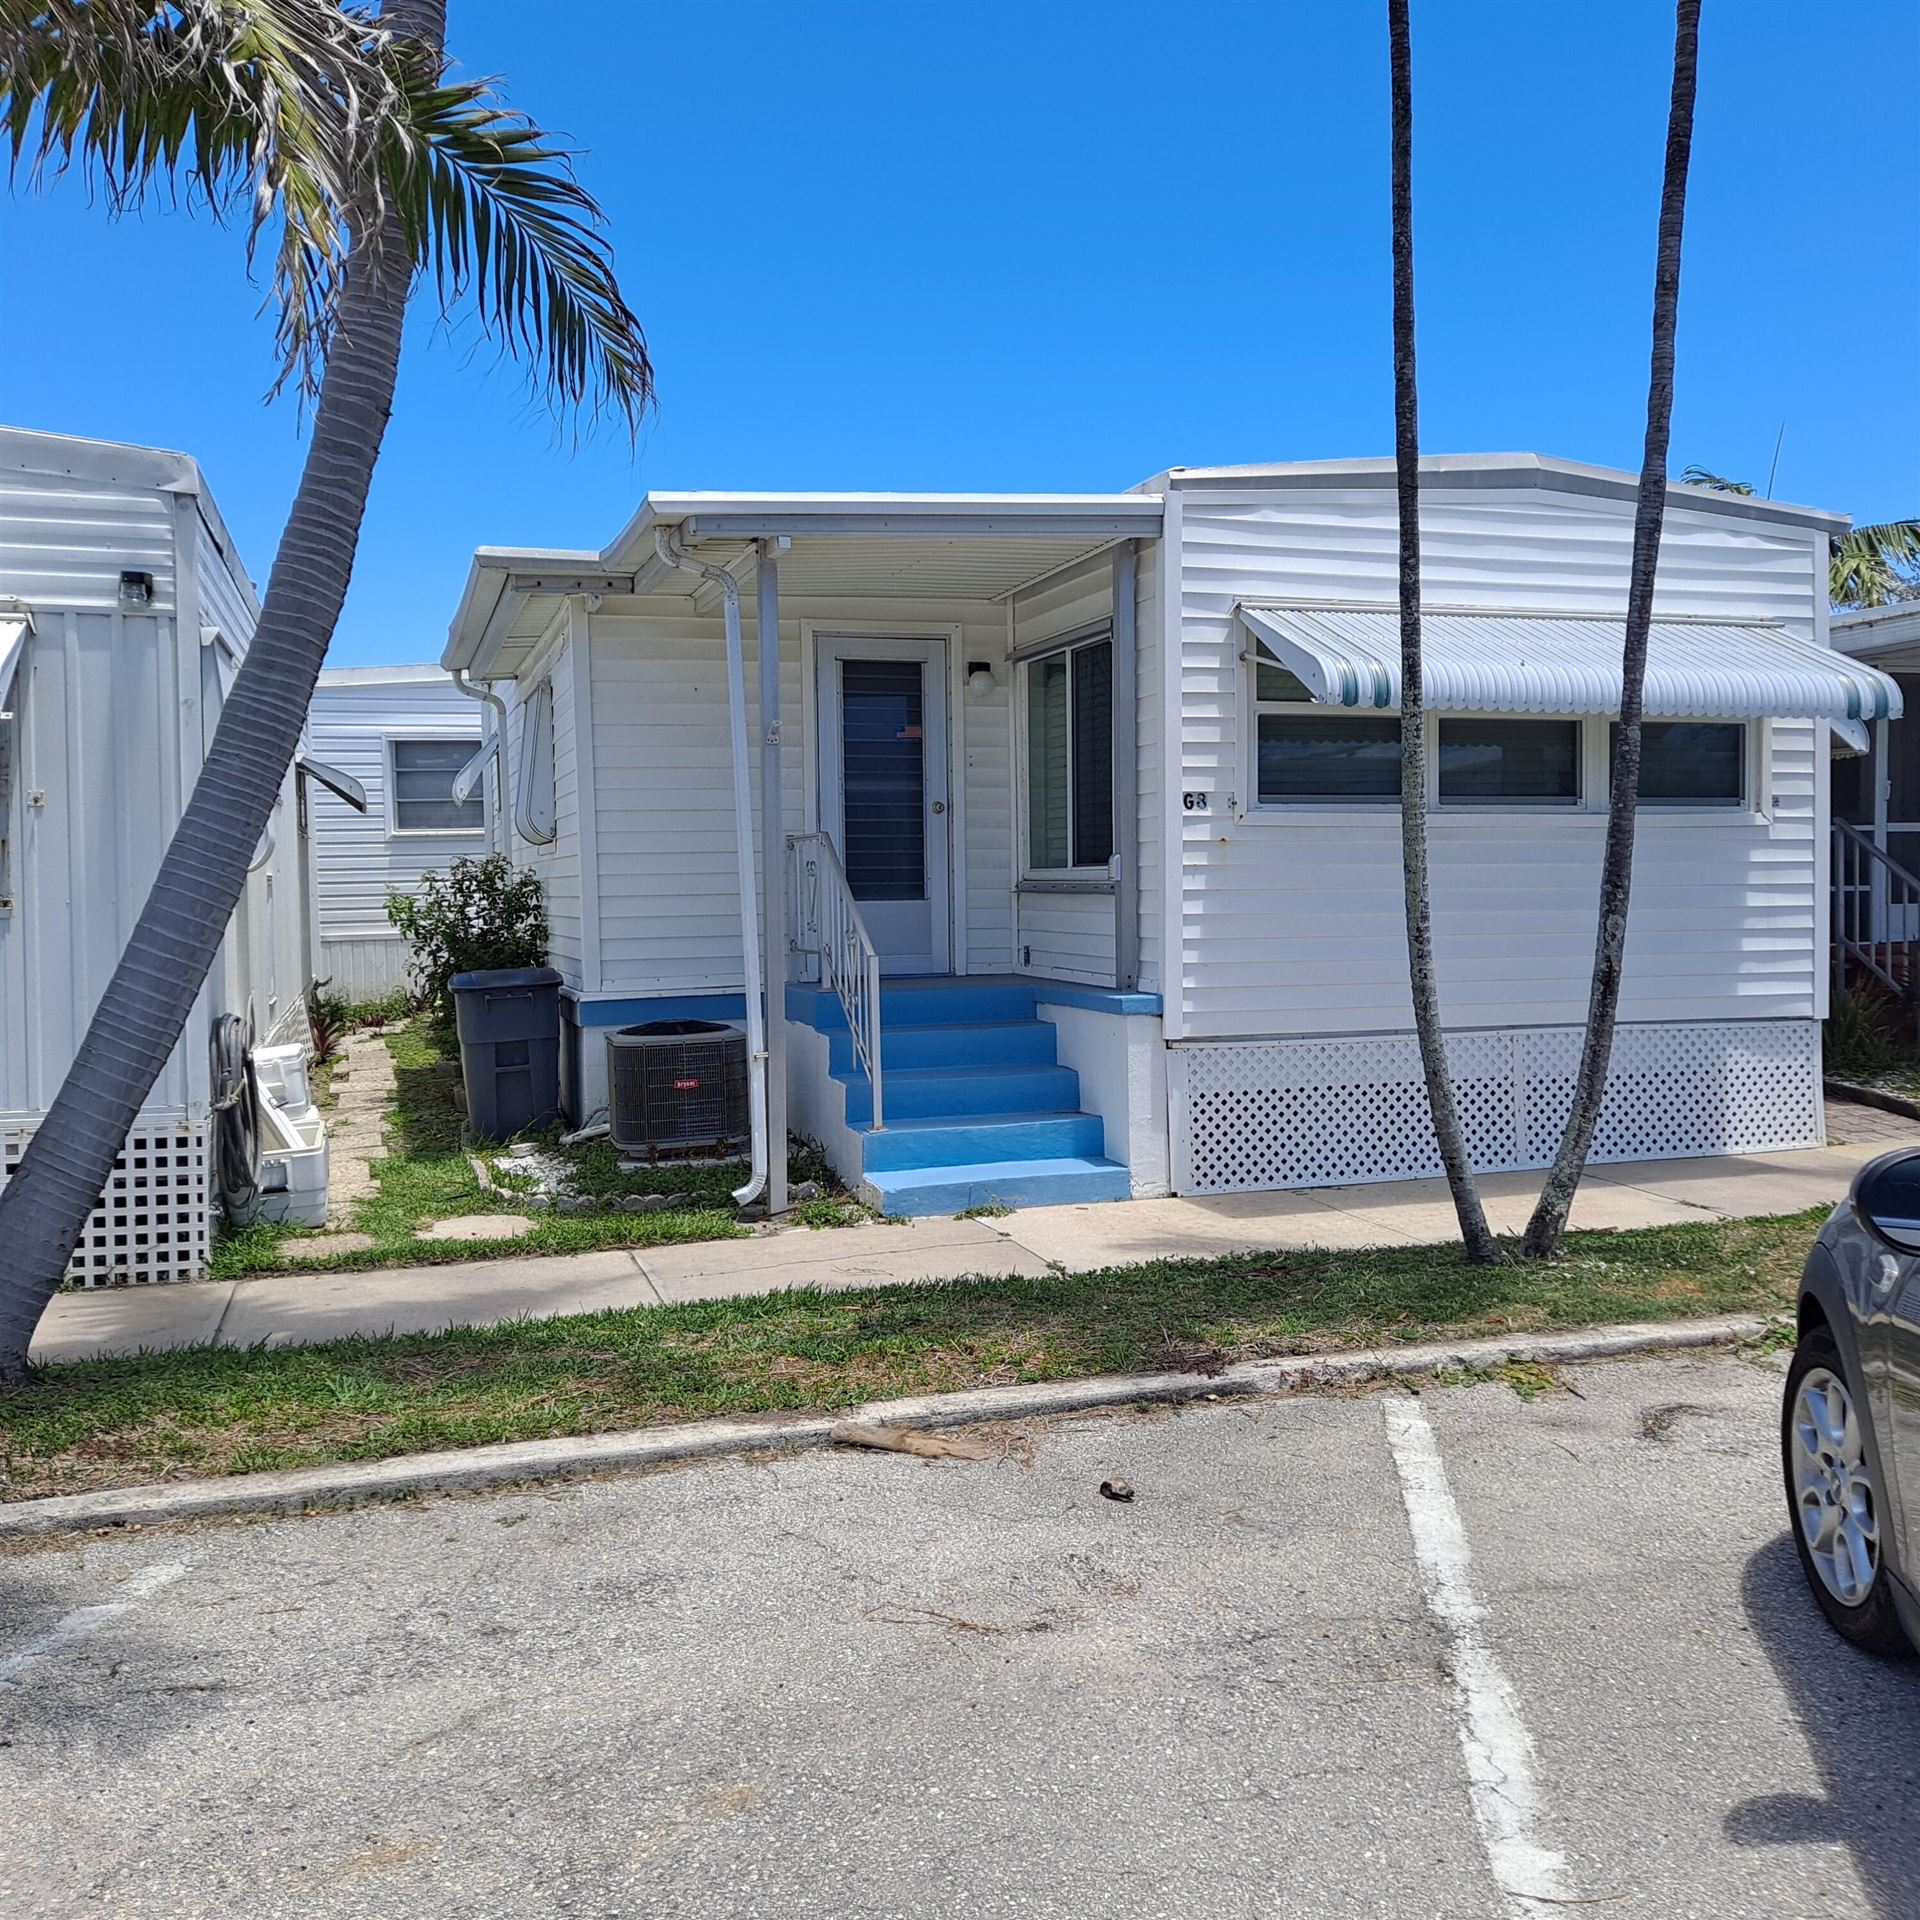 8 Ruthmary Avenue #G8, Briny Breezes, FL 33435 - MLS#: RX-10720511